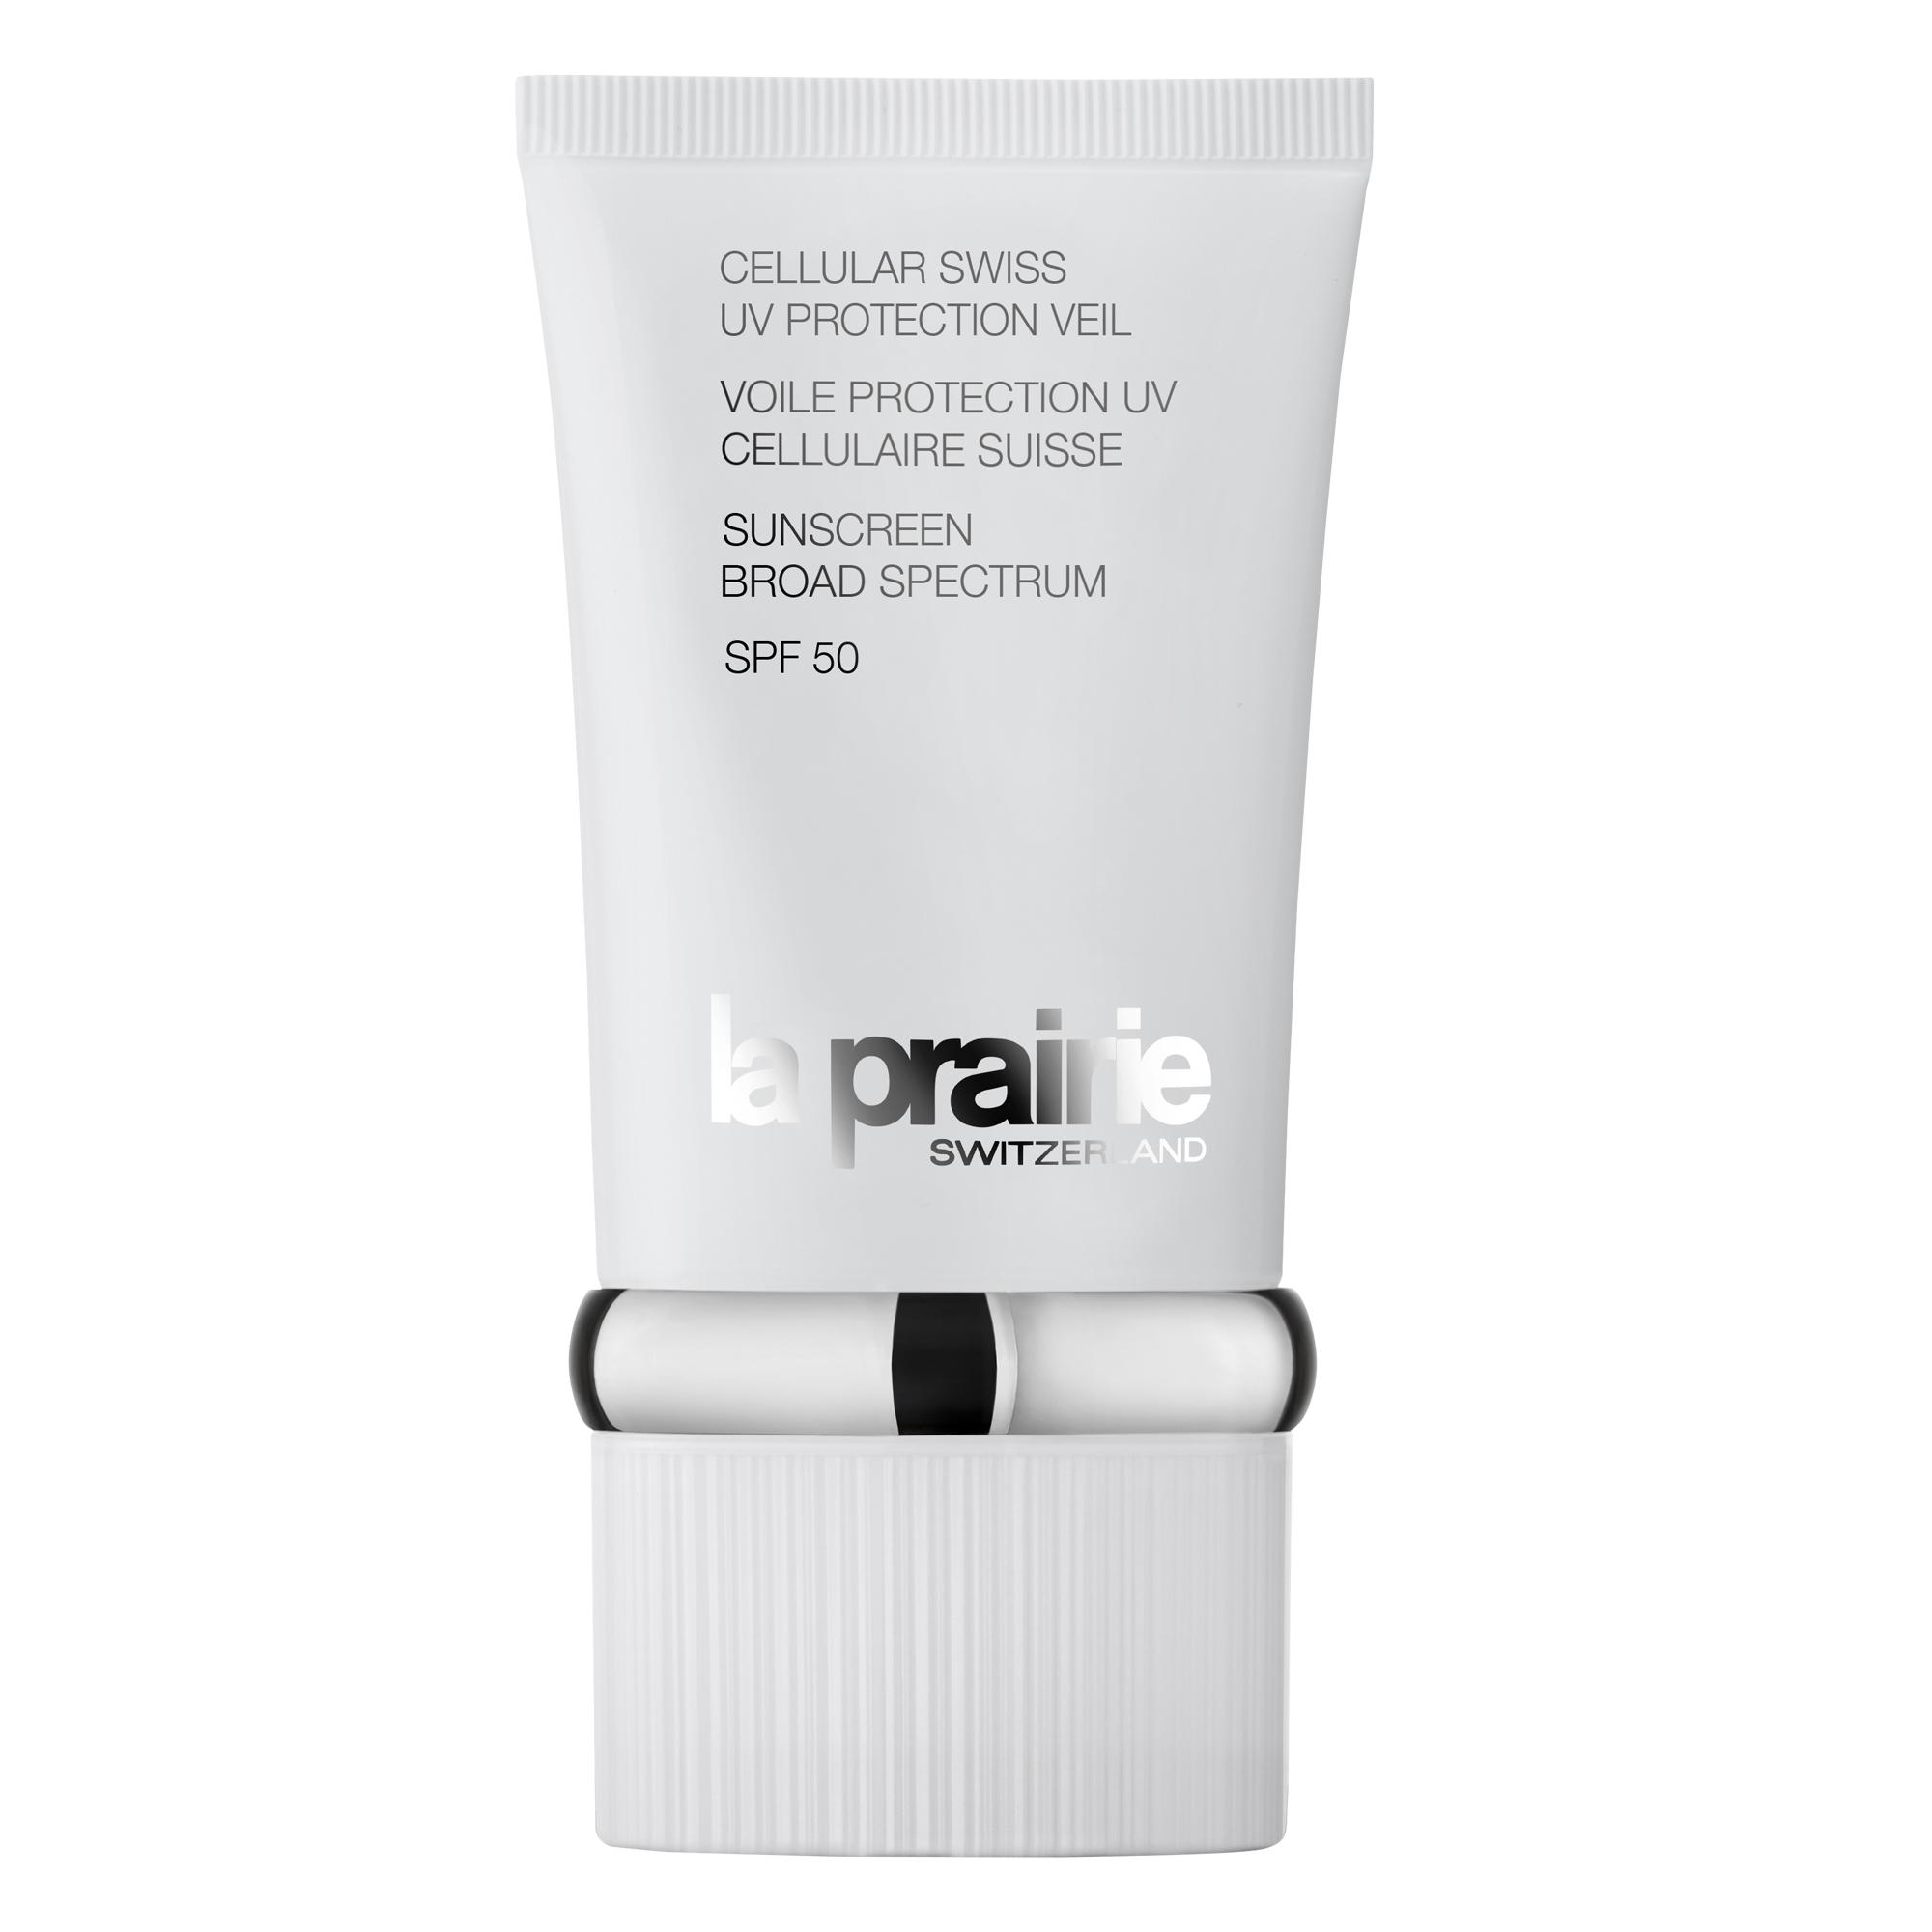 Cellular Swiss UV Protection Viel SPF 50